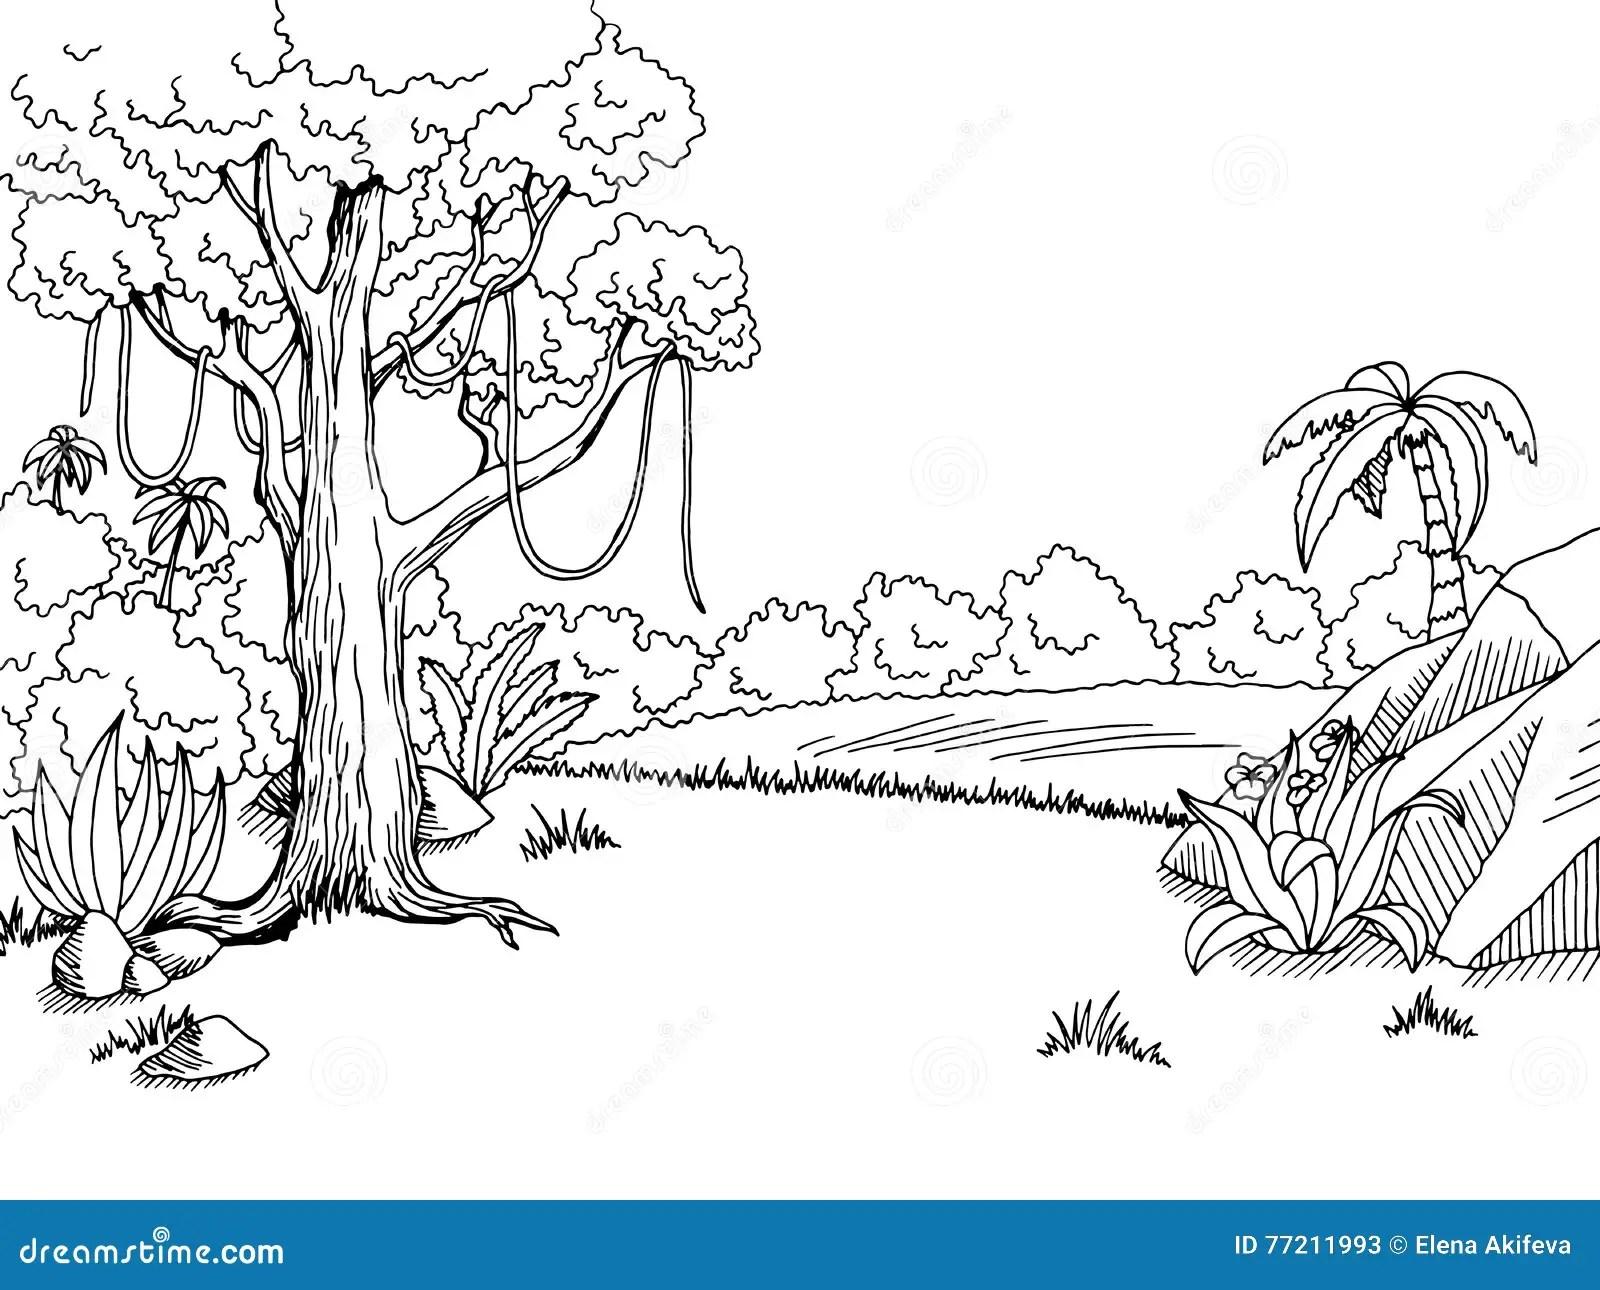 Jungle Forest Graphic Art Black White Landscape Sketch